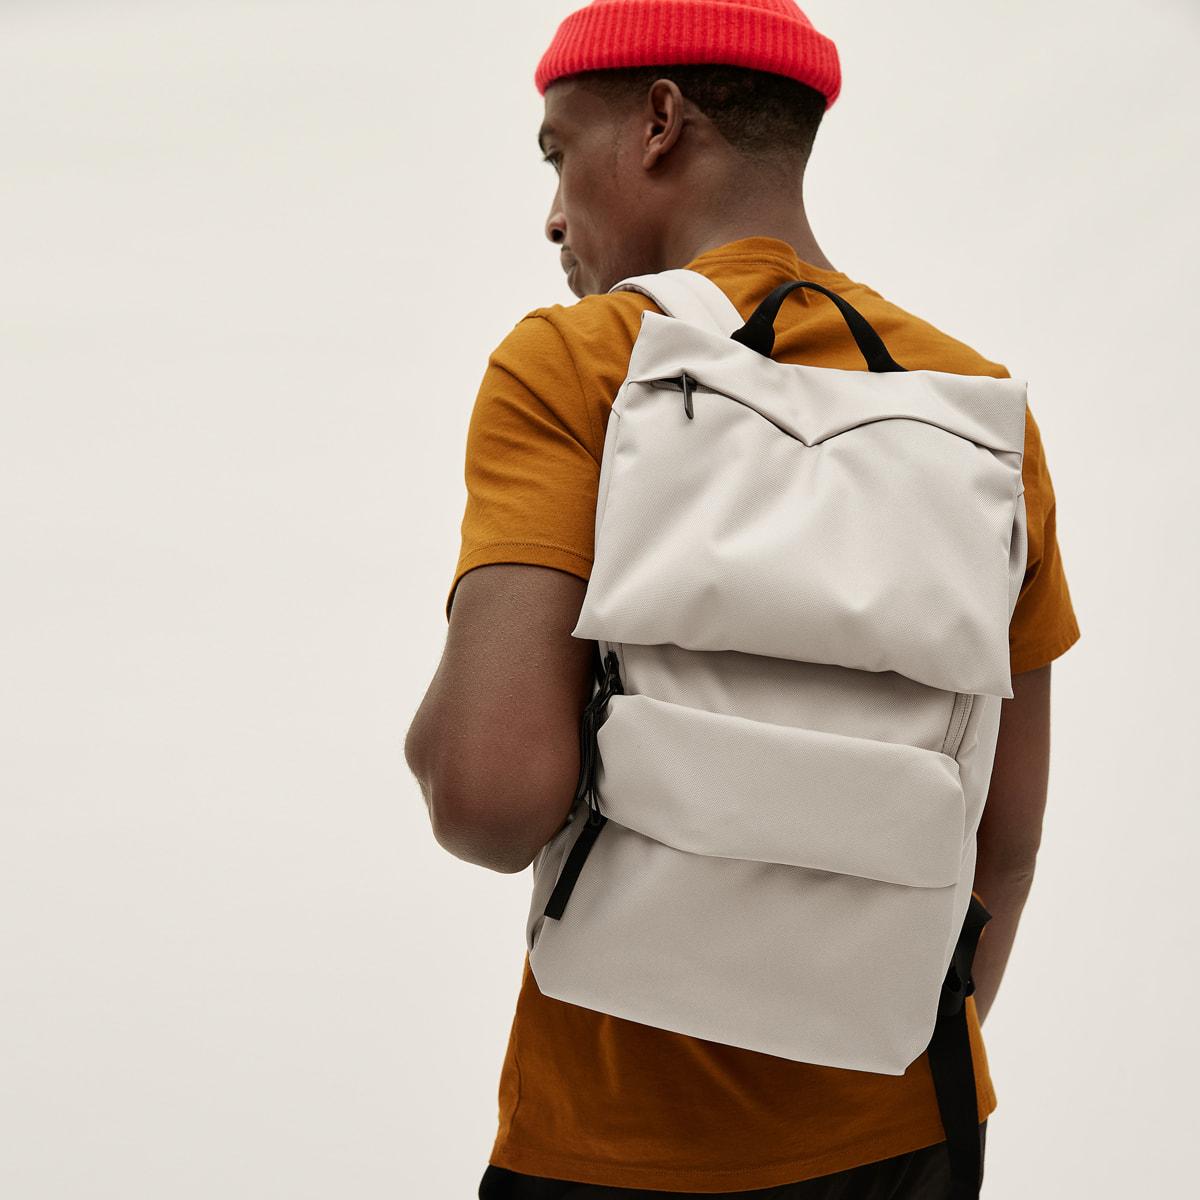 Best EDC backpack under 100